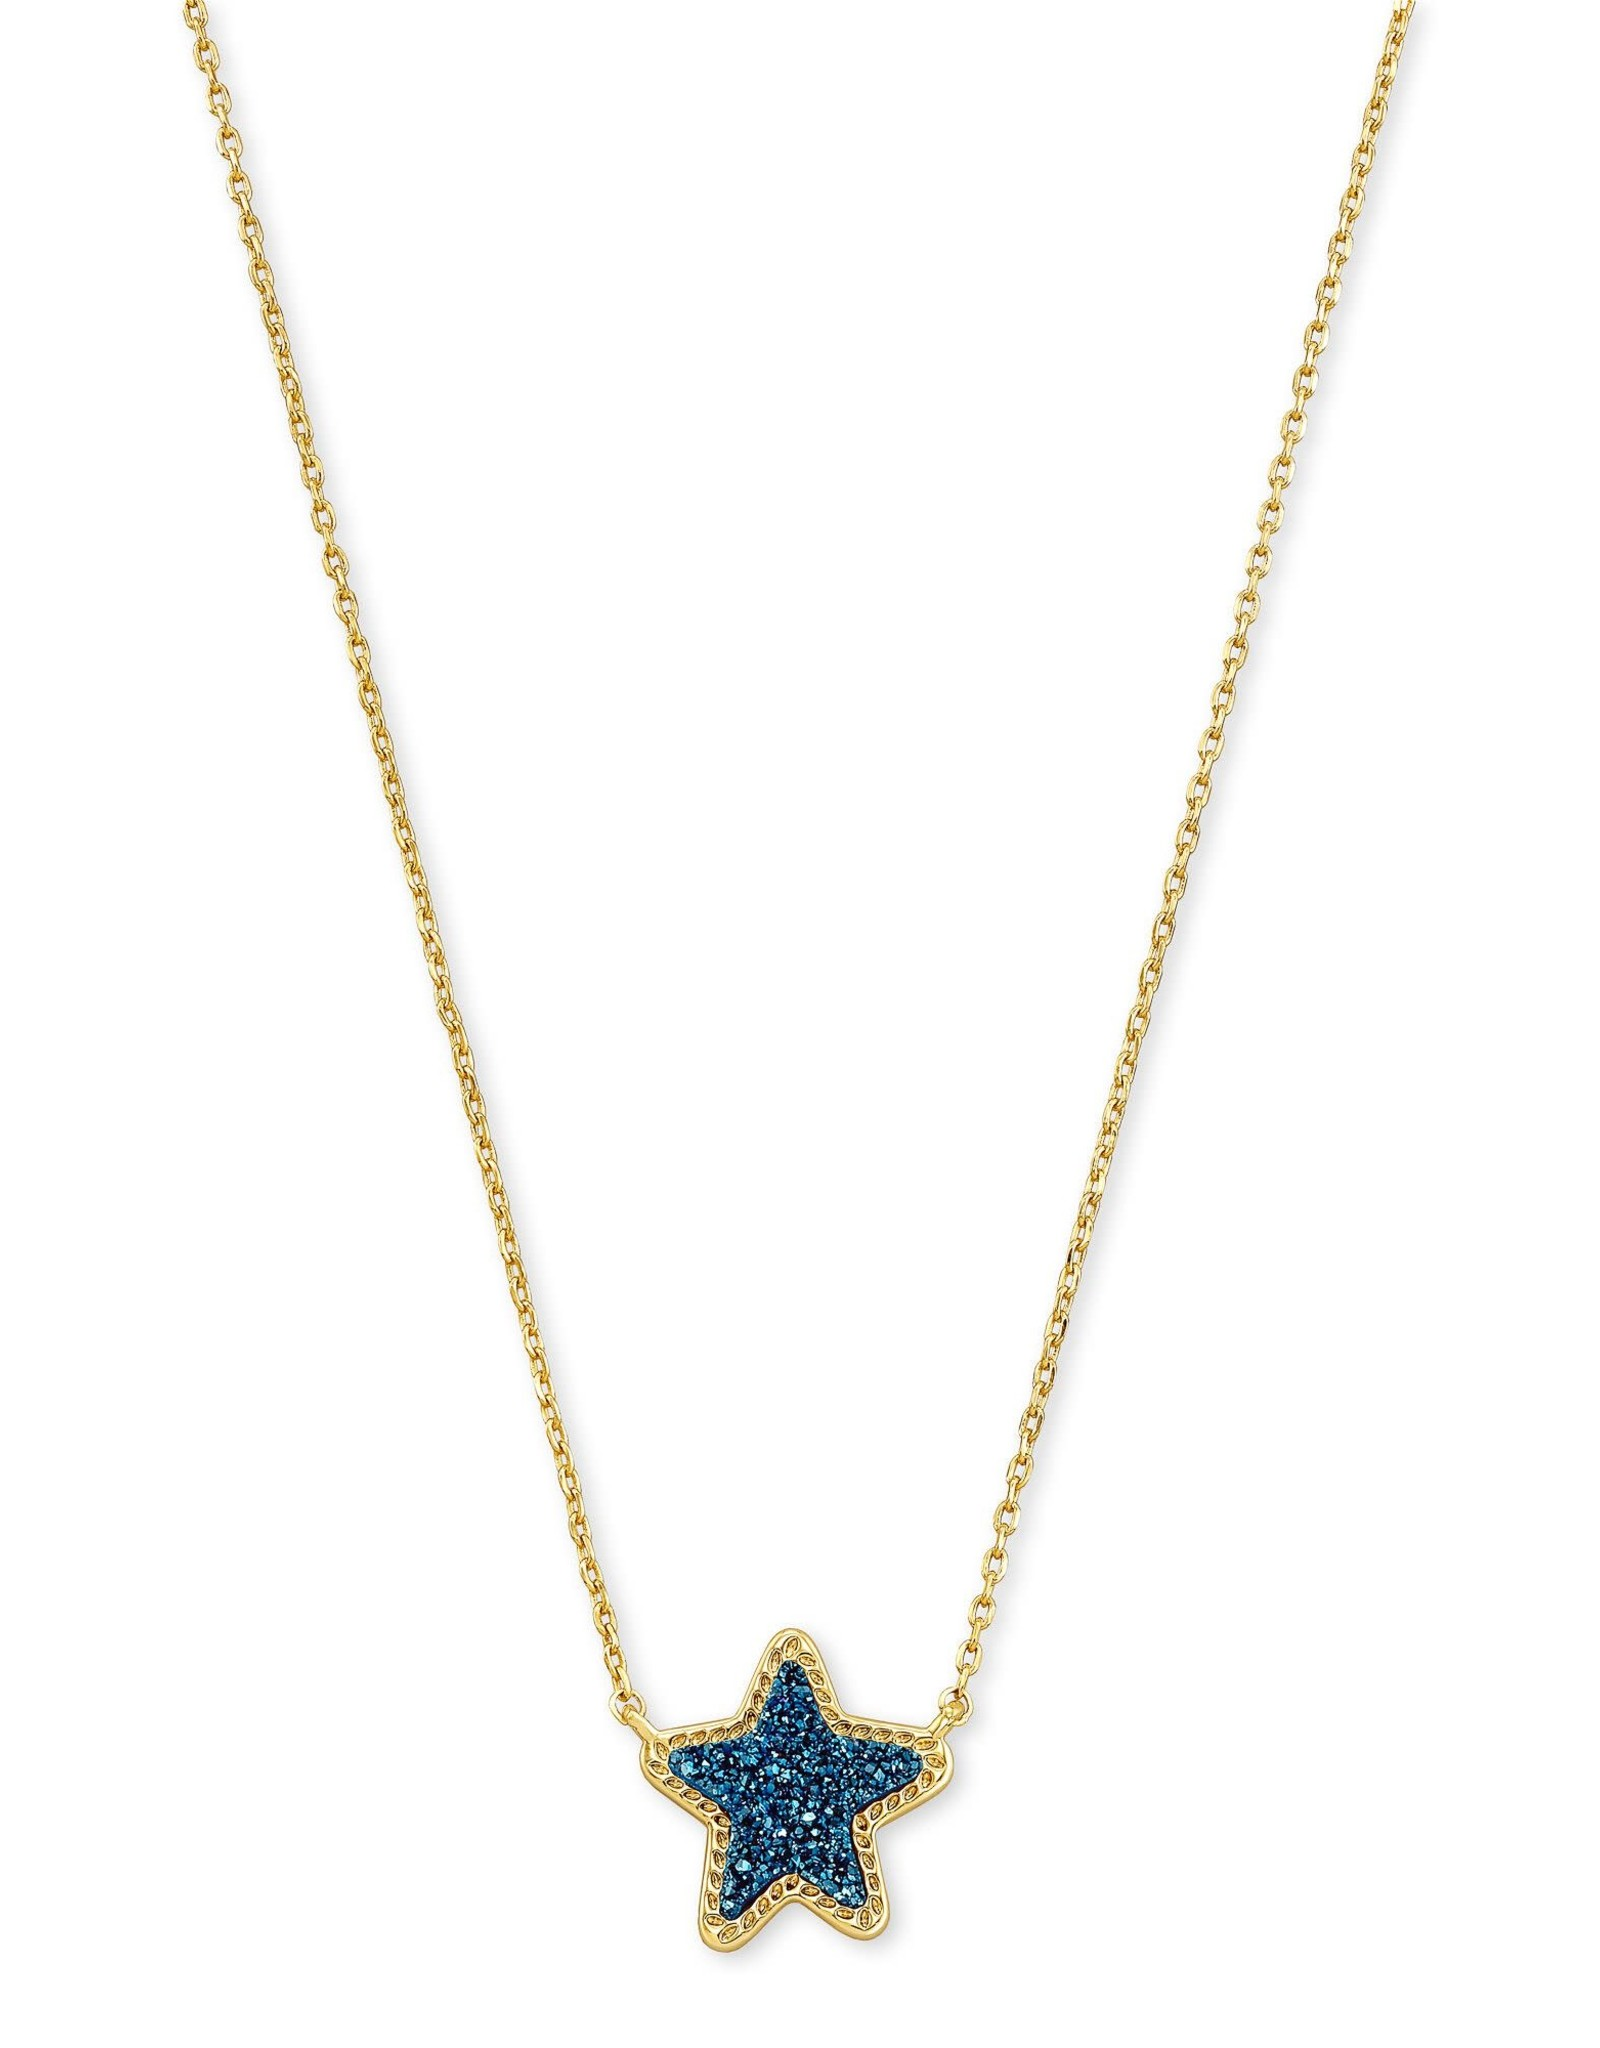 Kendra Scott Jae Star Short Pendant - Blue Drusy/Gold